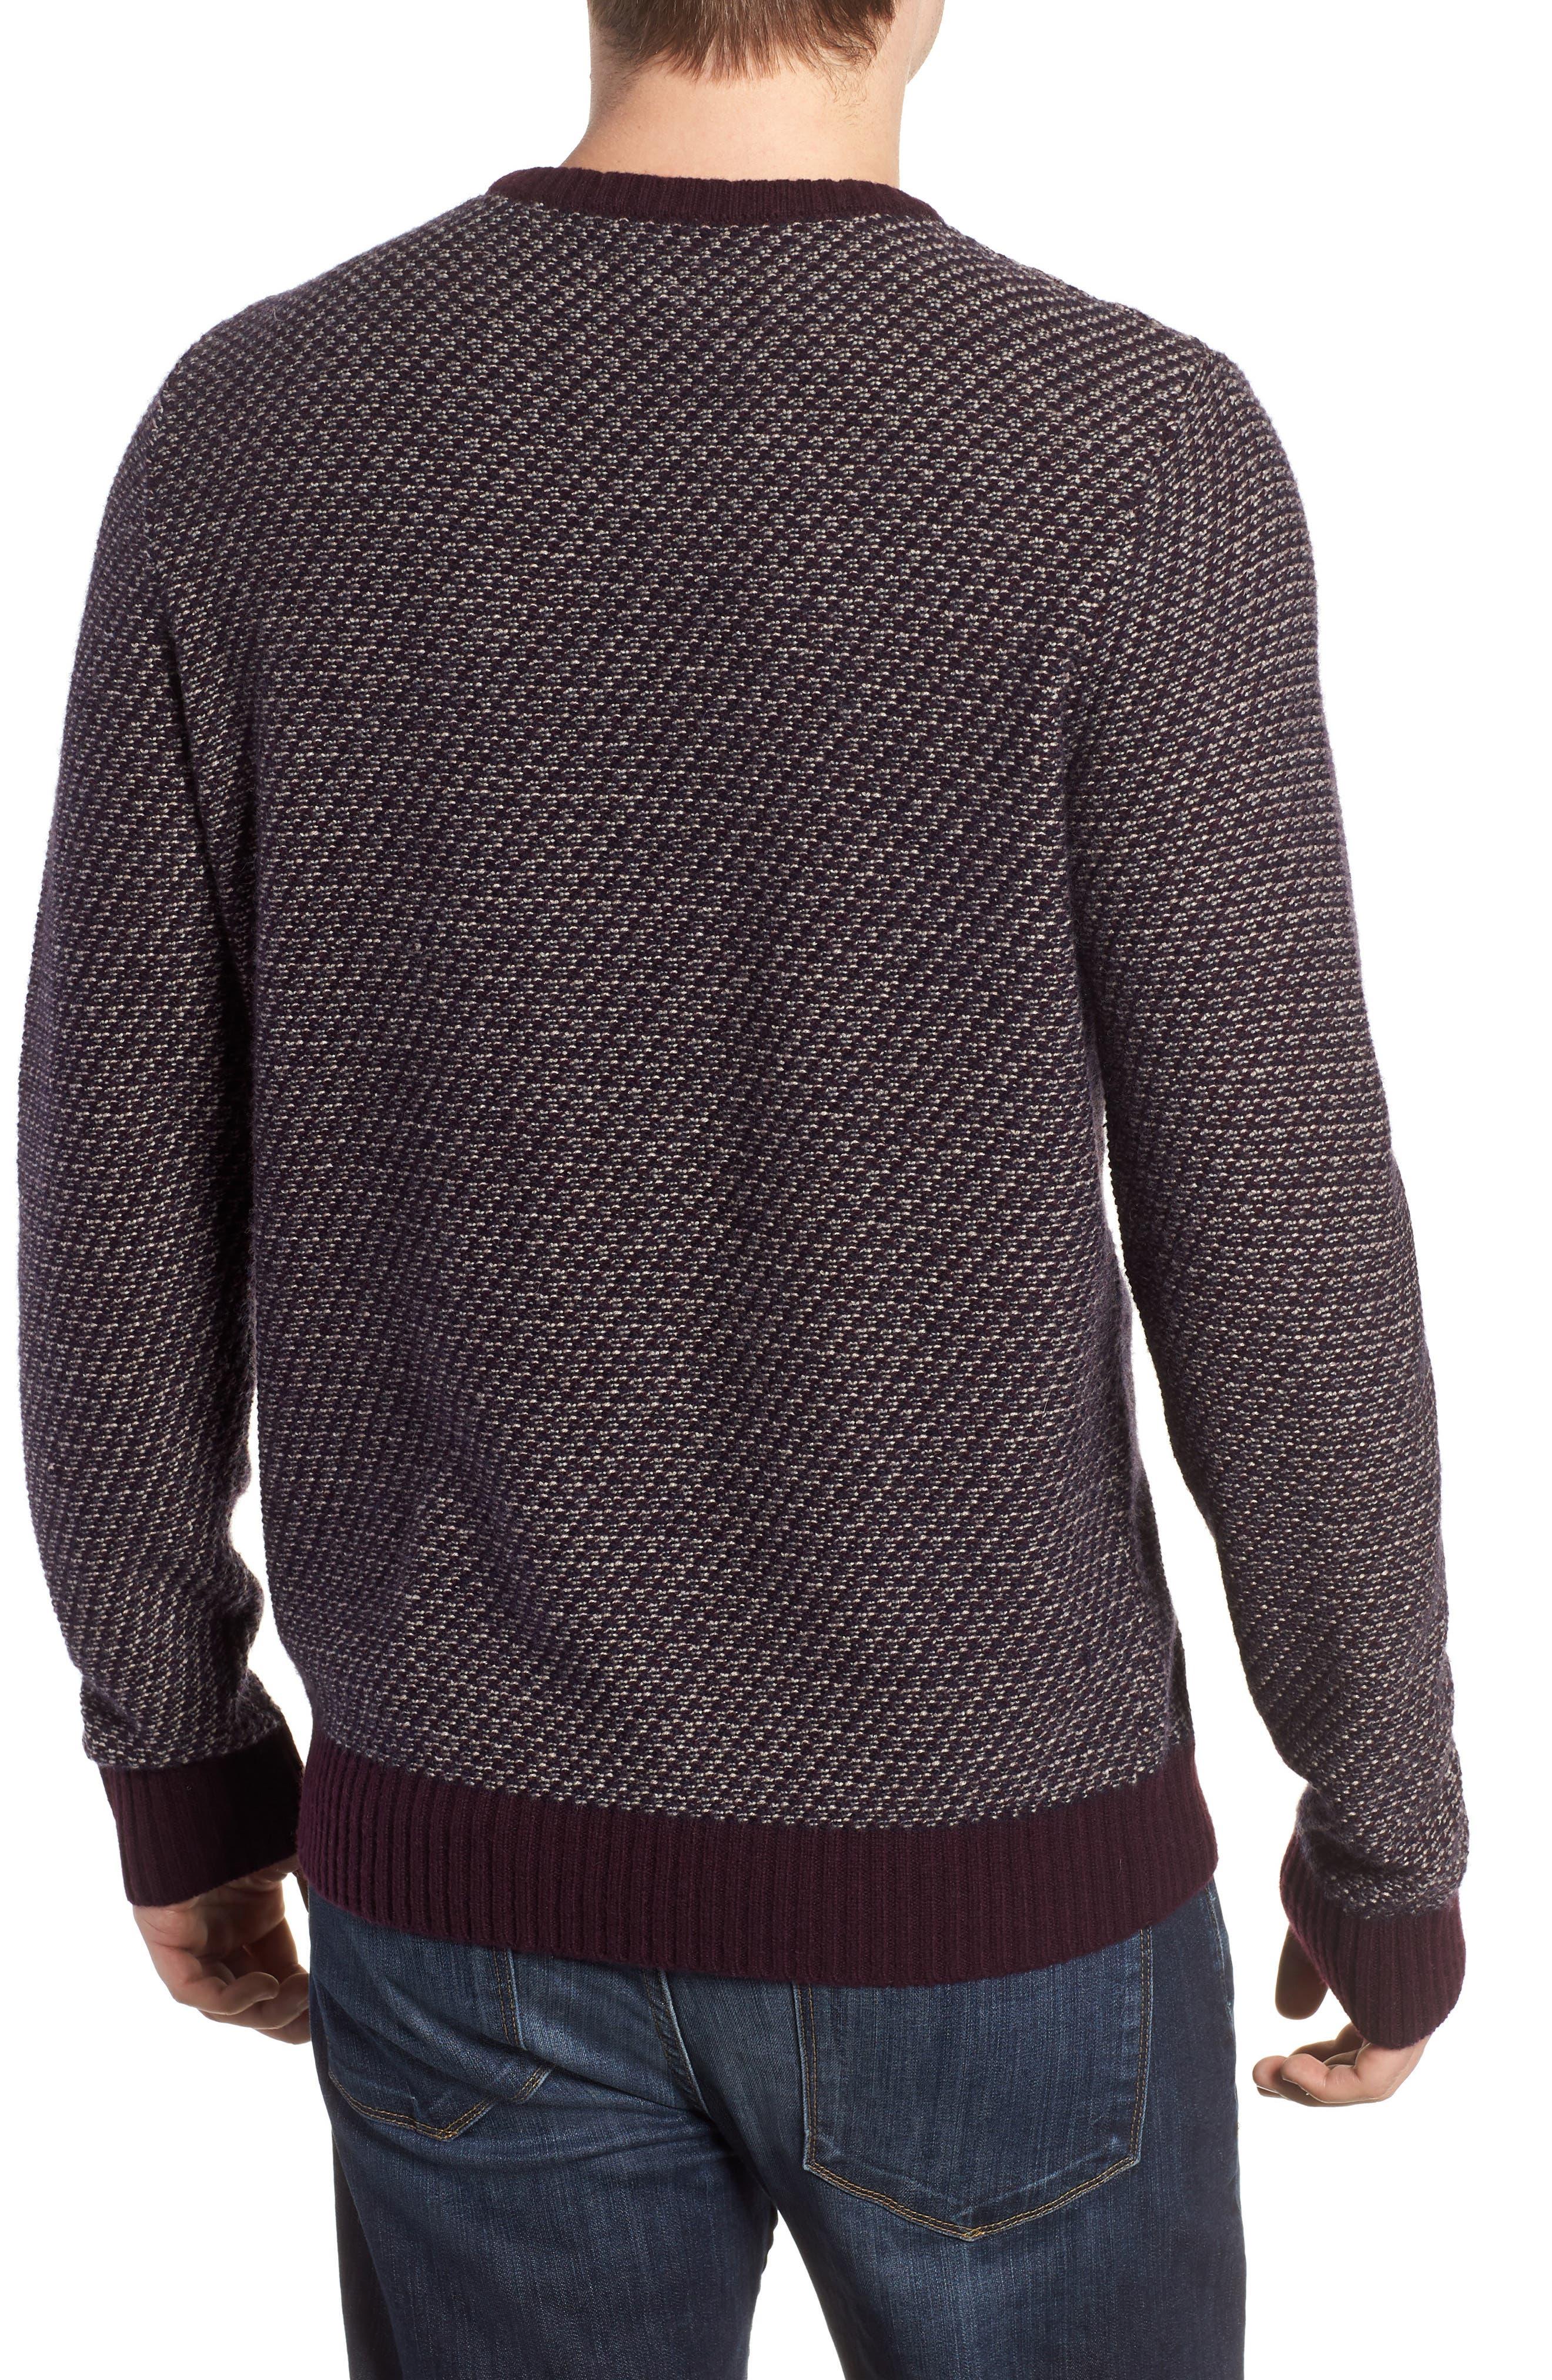 Jacquard Wool & Cashmere Sweater,                             Alternate thumbnail 2, color,                             938